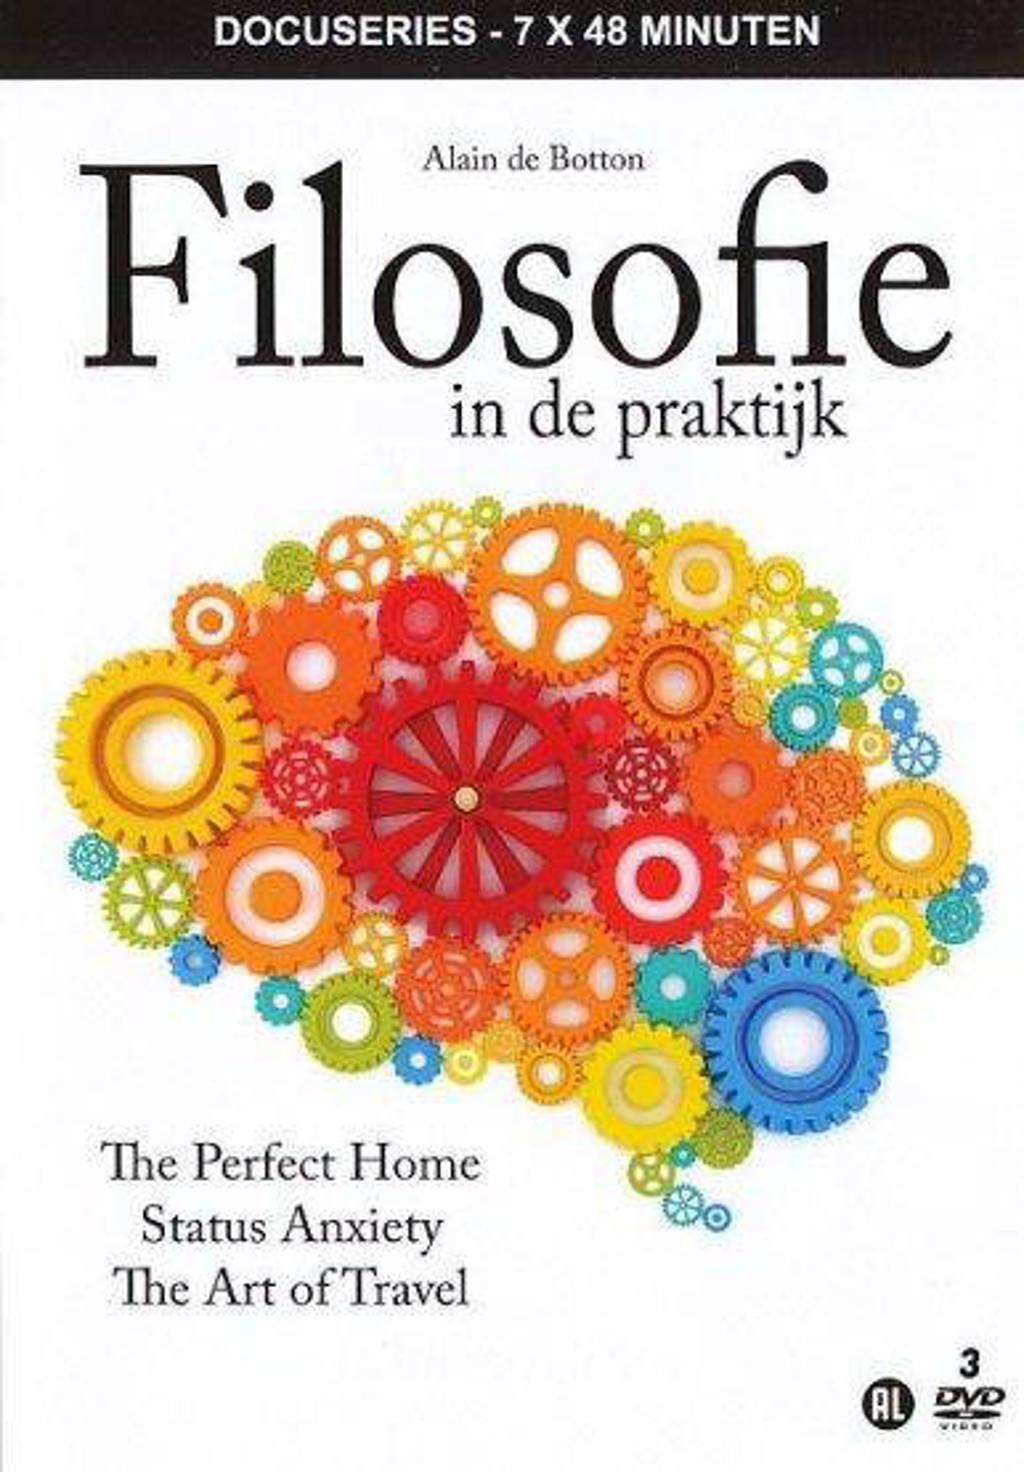 Filosofie in de praktijk - Alain de Botton (DVD)